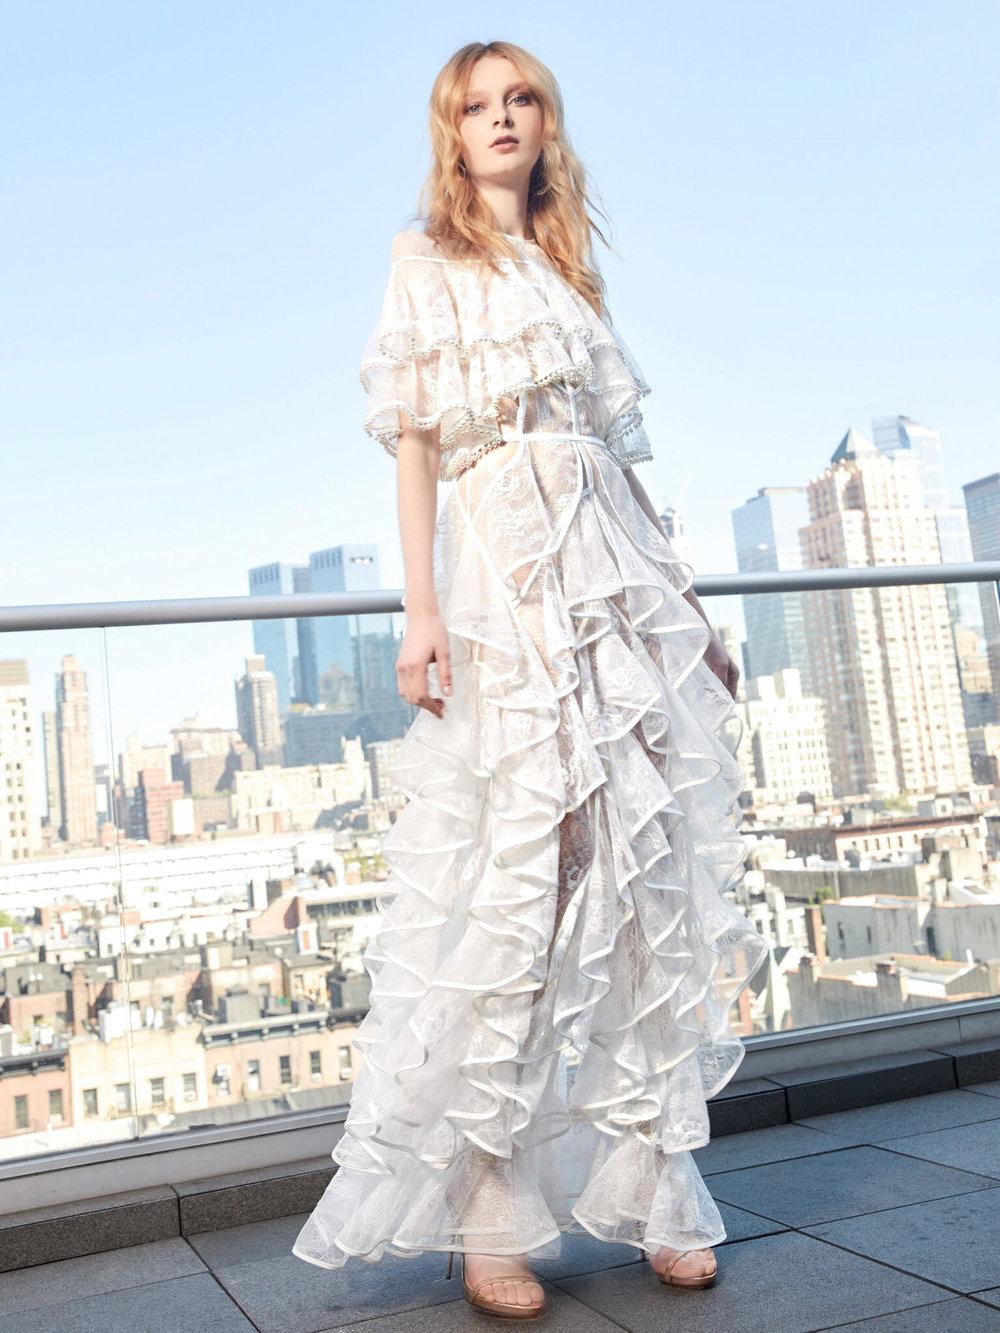 Season: Fall 2017    Gown name: Alberta 圓領領口合身剪裁的婚紗禮服    Description: 圓領領口合身剪裁的婚紗禮服,由肩膊至裙擺由層層波浪狀蕾絲薄紗交織, 每一層紗都縫上顆顆水滴狀珍珠流蘇,非常活潑美麗。新娘子穿上後舞動更見活潑,不但 適用於宴會中的舞蹈環節,與海灘婚禮亦是絕佳組合。